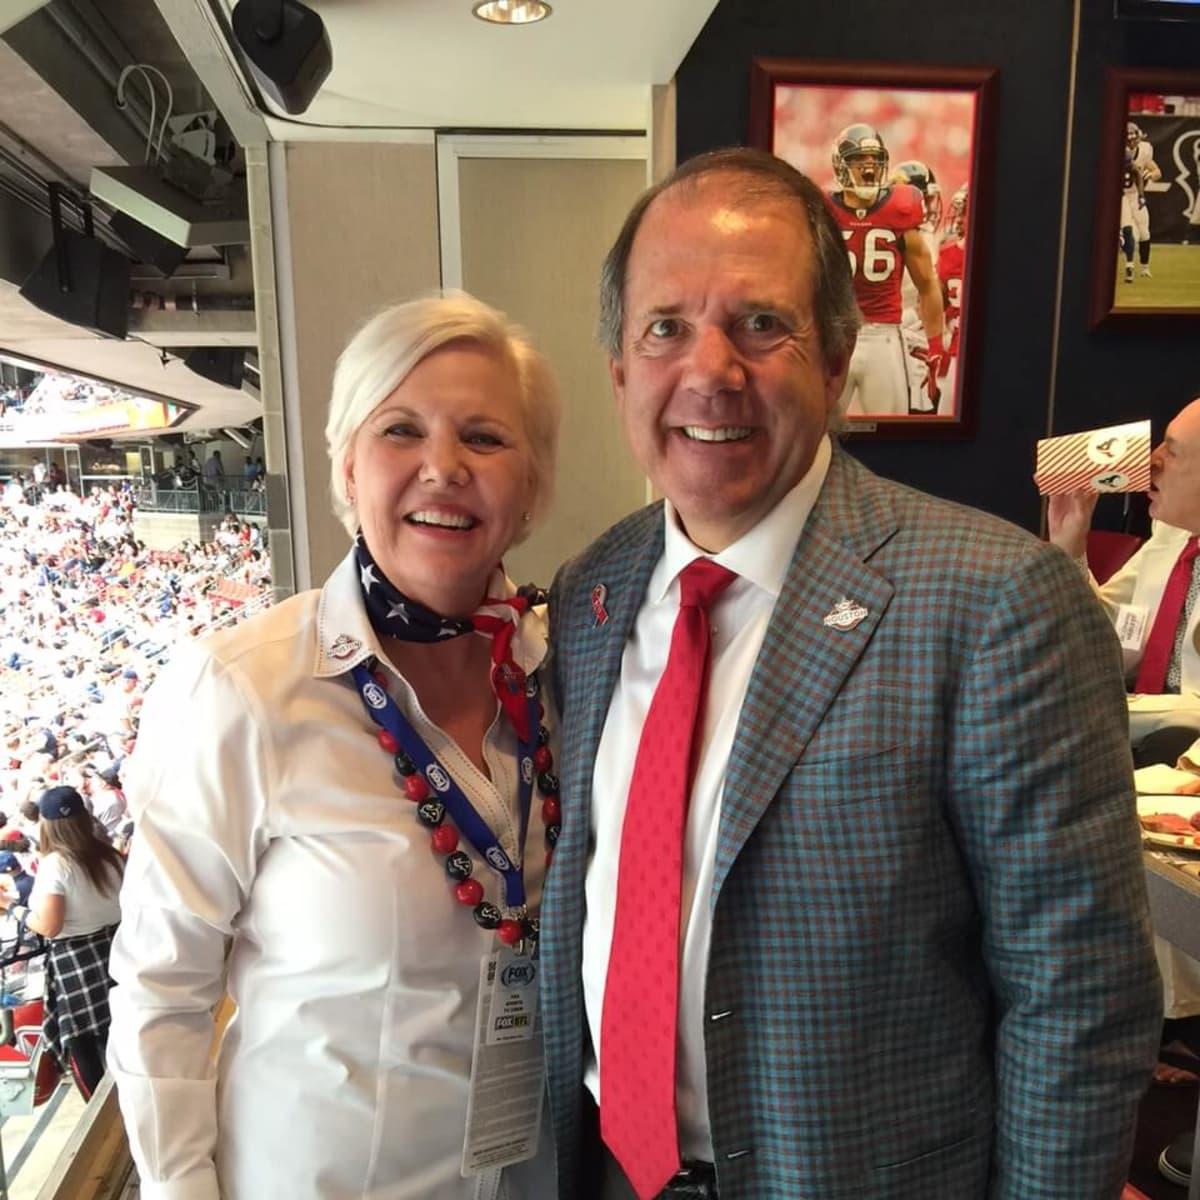 Houston Texans season opener, 9/26 Sallie Sargent, Ric Campo